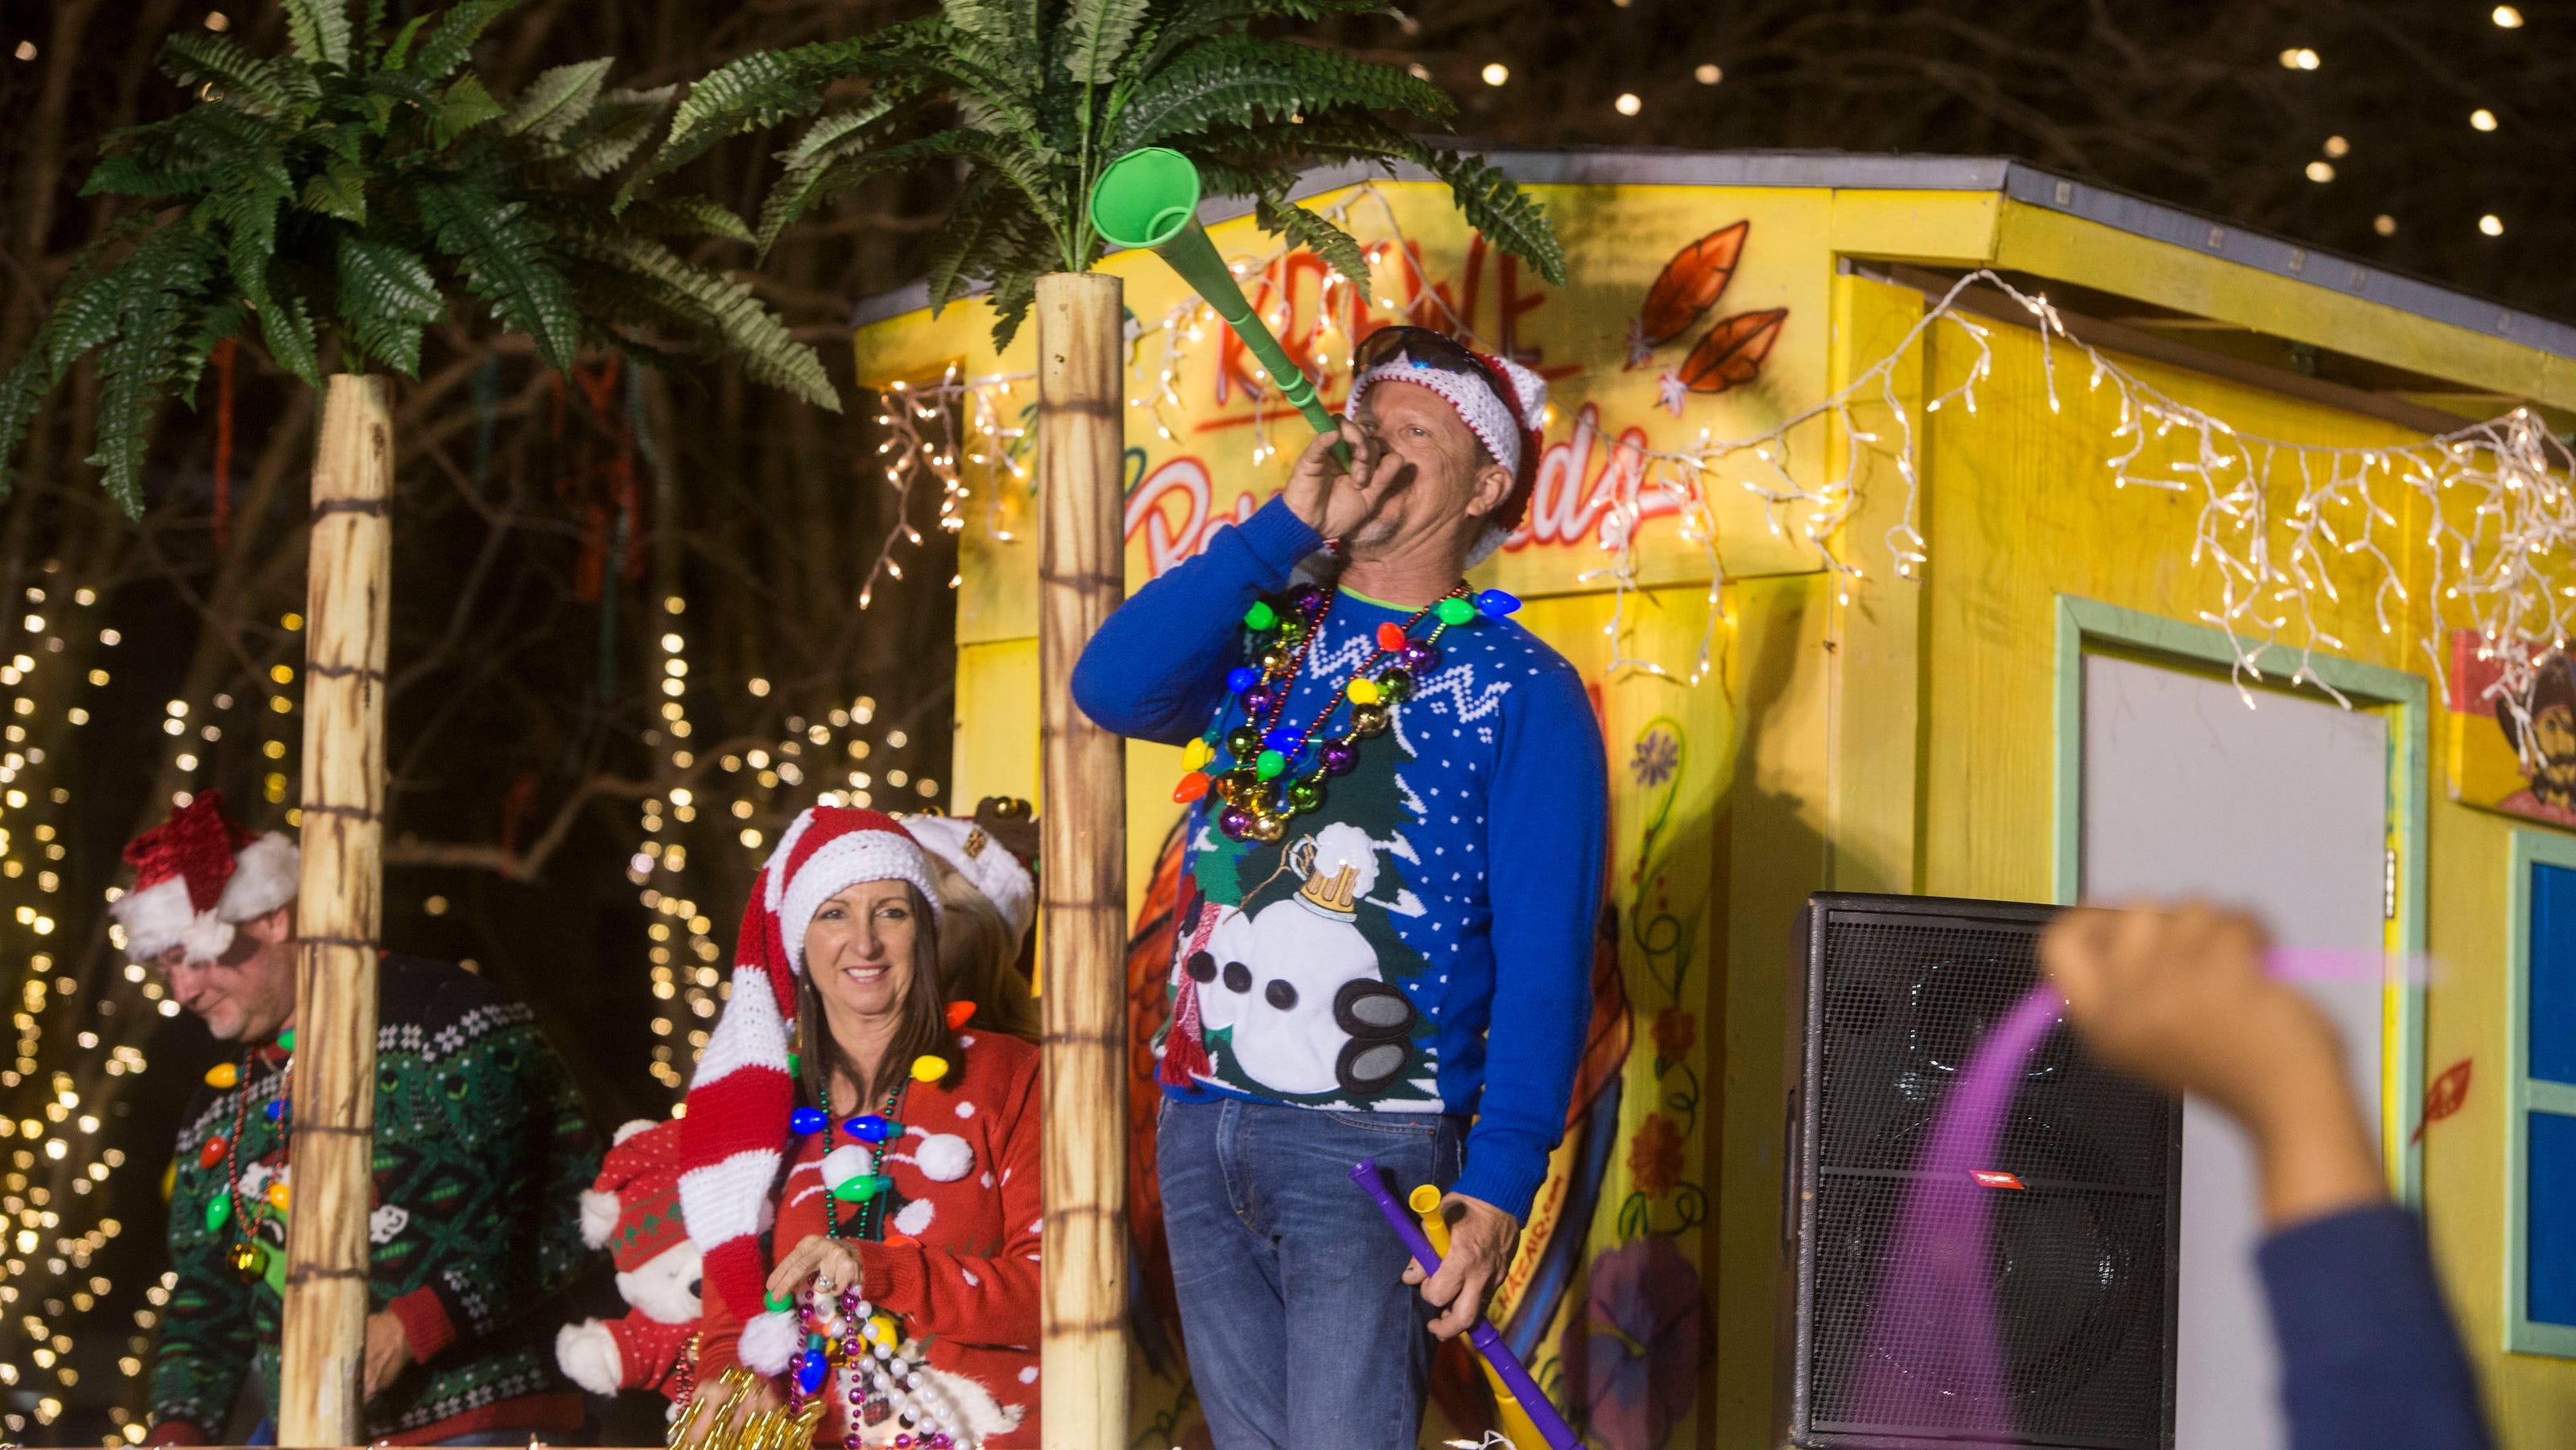 When Is 2021 Pensacola Christmas Parade Pensacola Cox Christmas Parade 2020 Canceled Because Of Covid 19